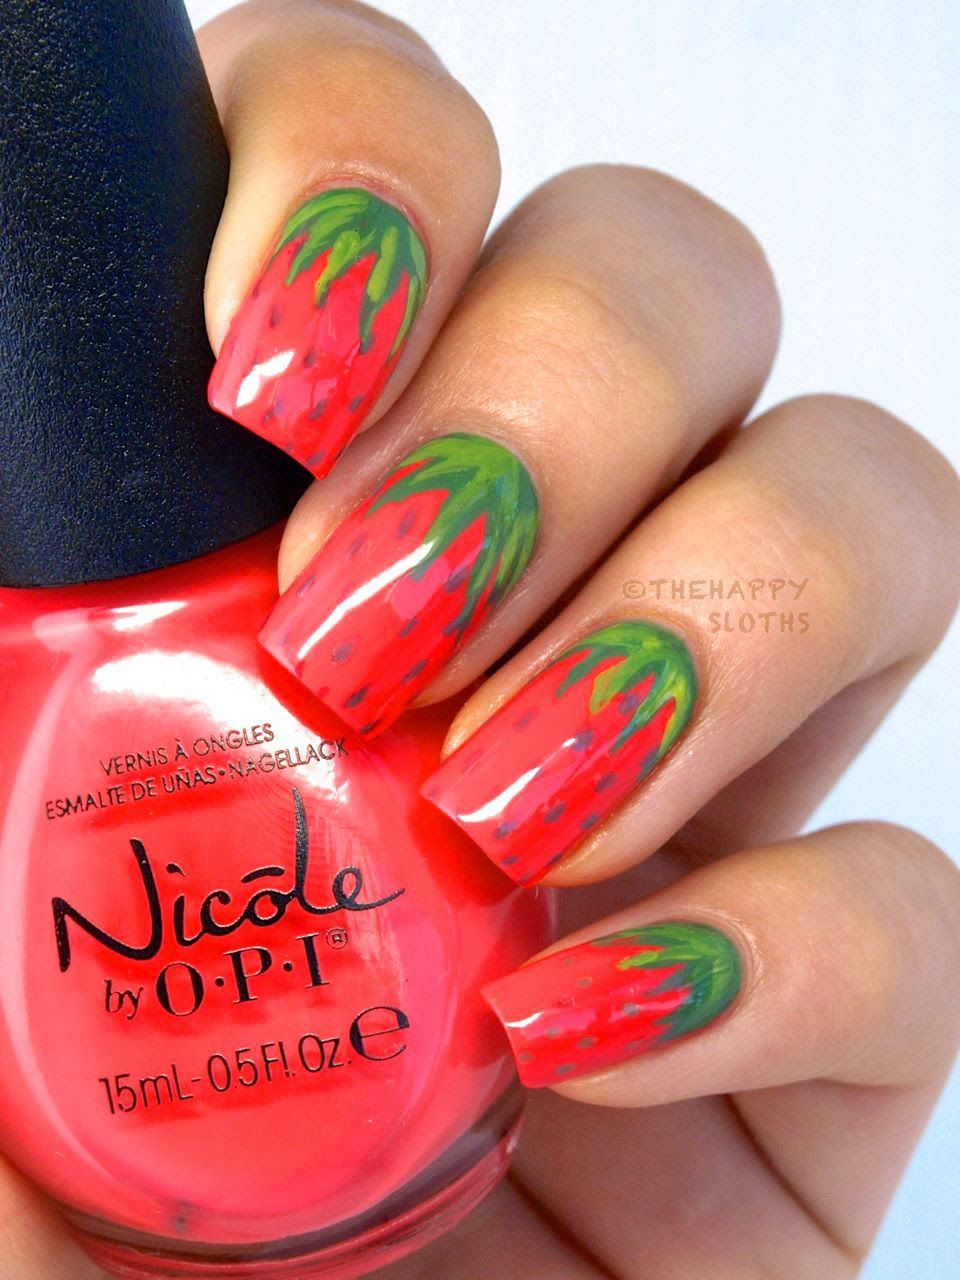 Strawberry manicure strawberry nail art design the happy sloths strawberry manicure strawberry nail art design the happy sloths prinsesfo Images